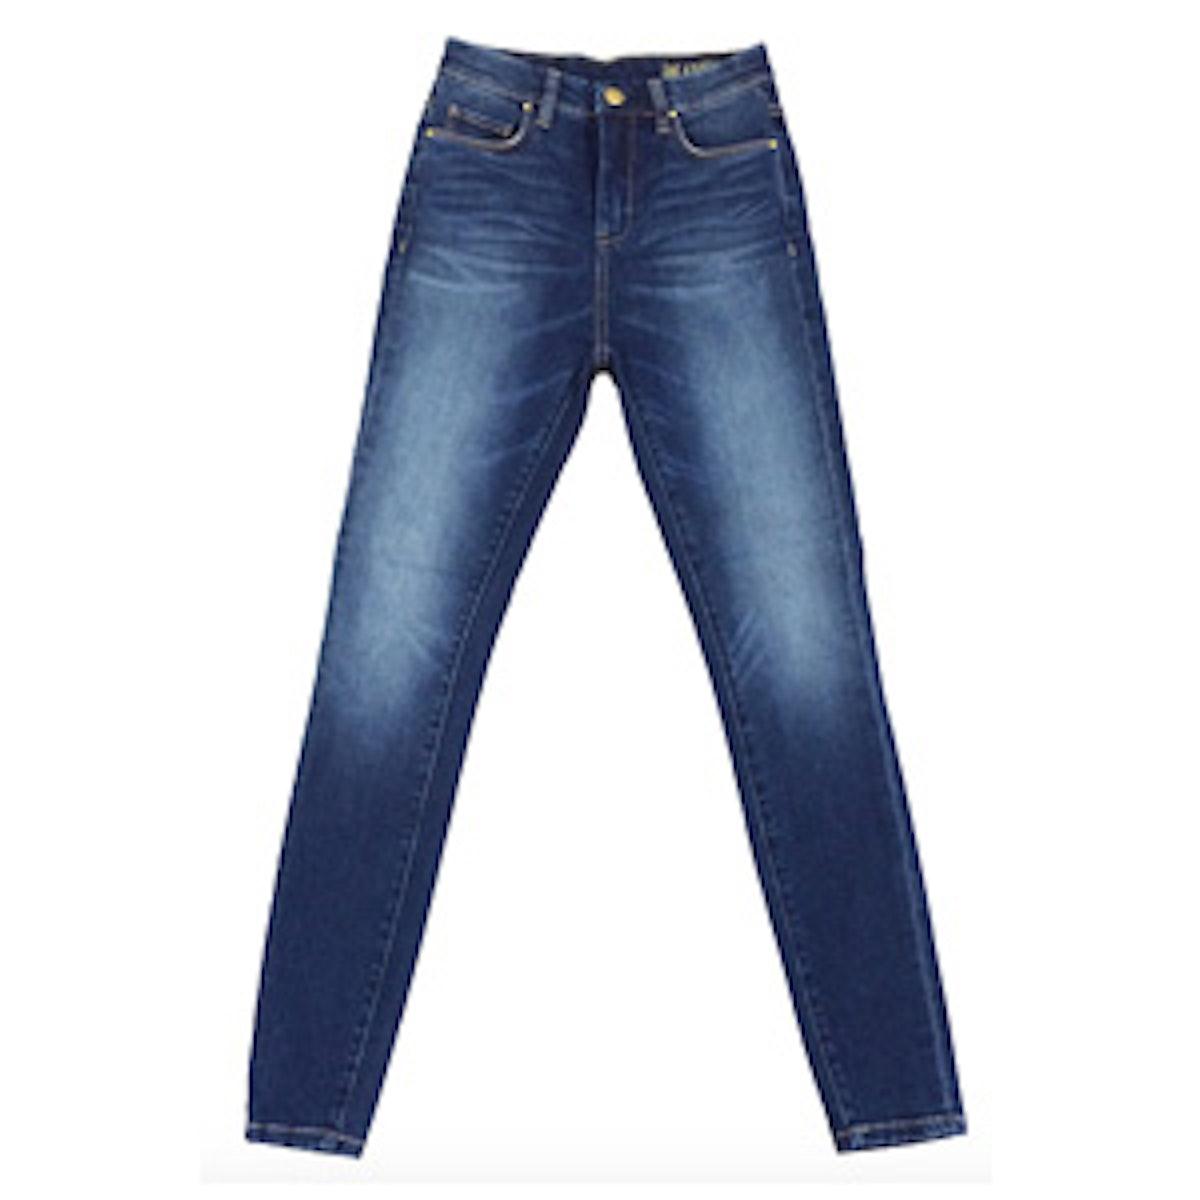 High Rise Skinny Jeans in Bae Watch